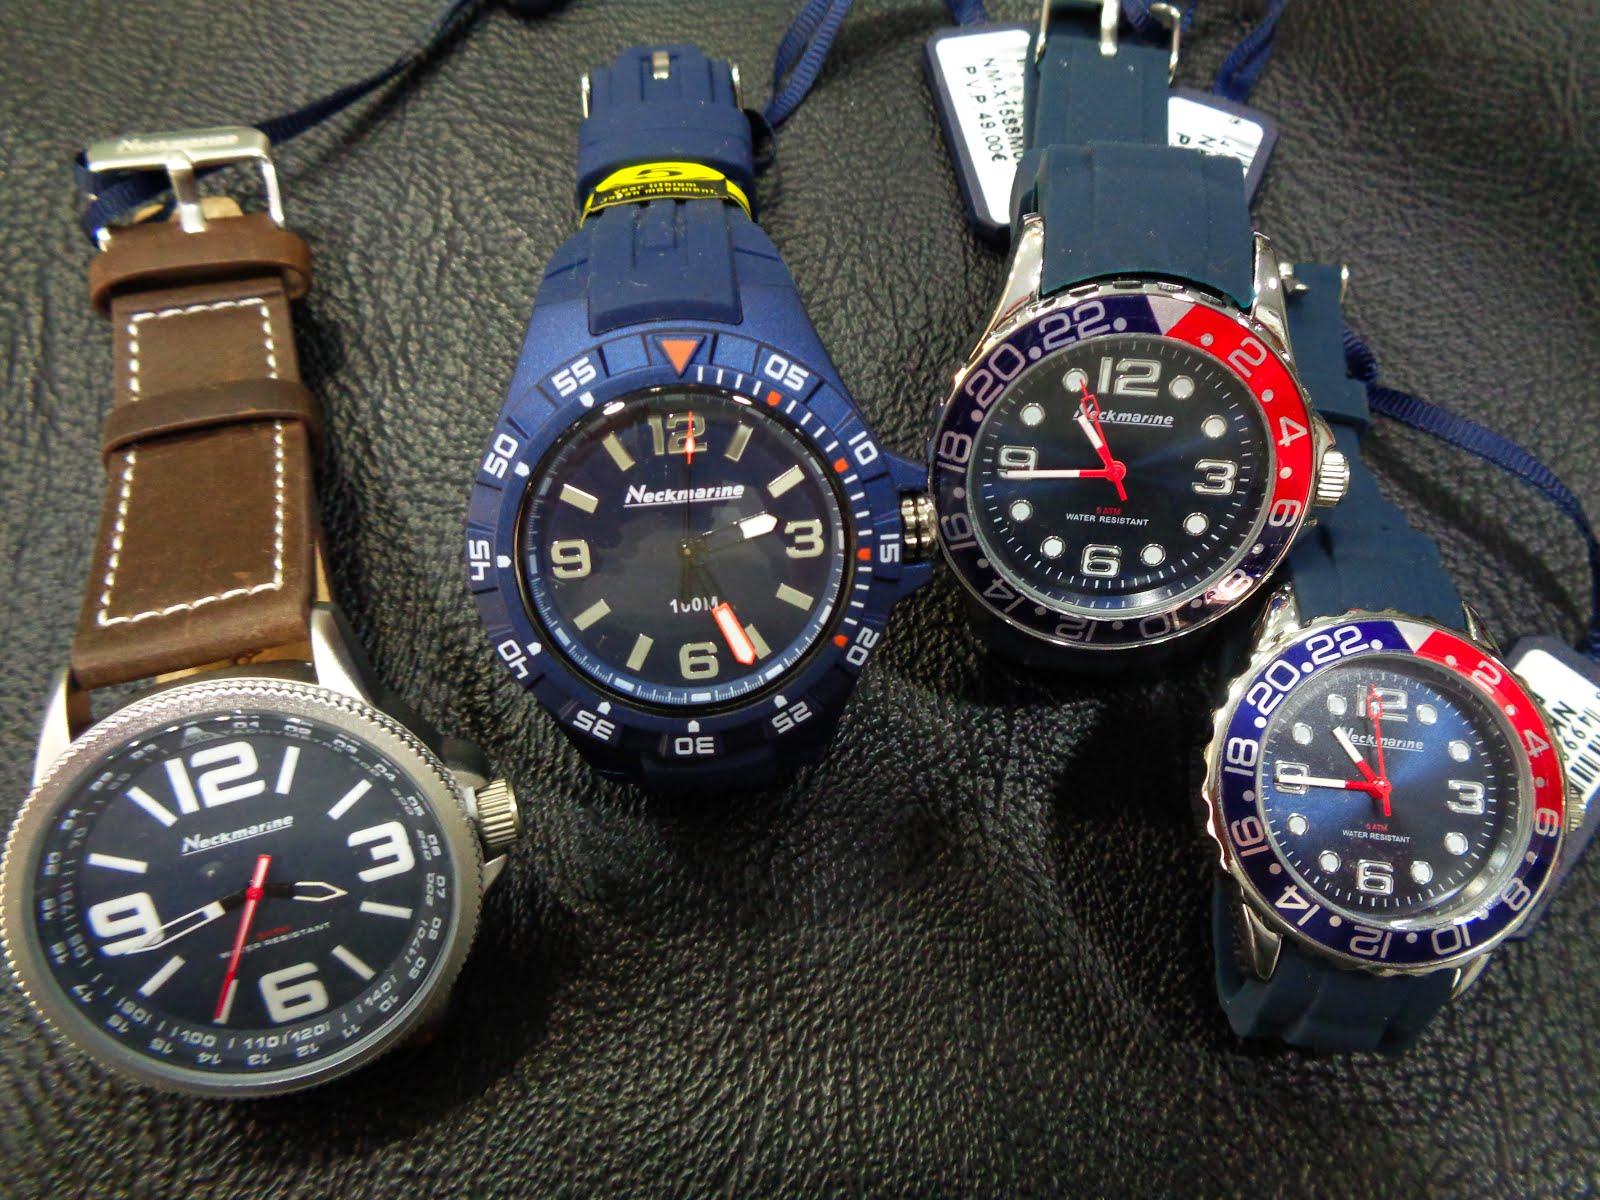 Relojes Neckmarine, acuáticos